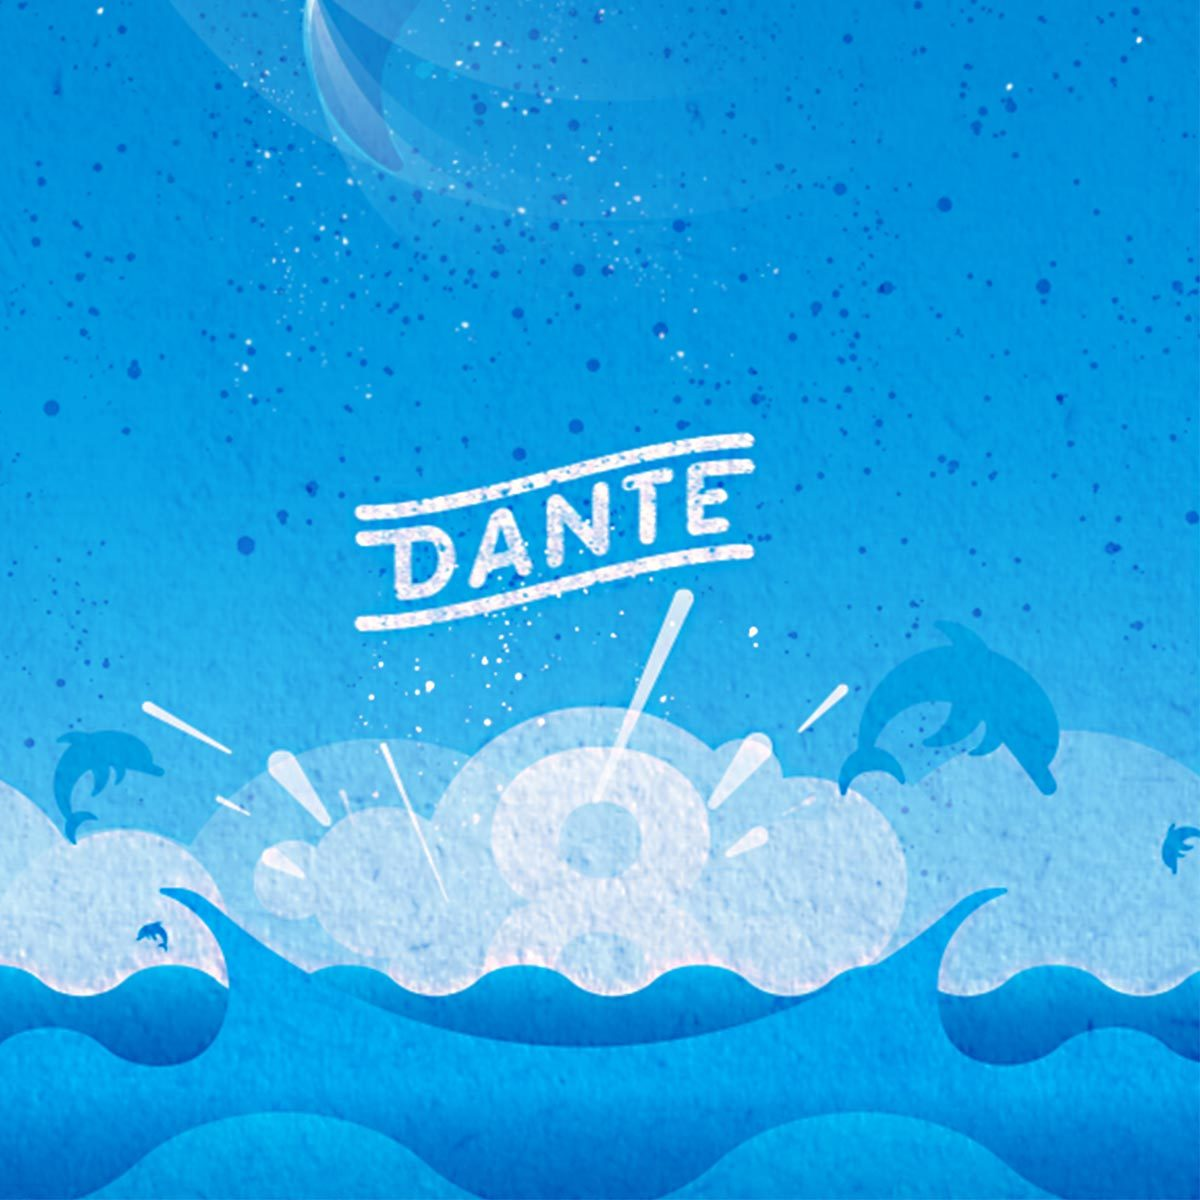 Dante Delphin Illustration 0 MHG Bern